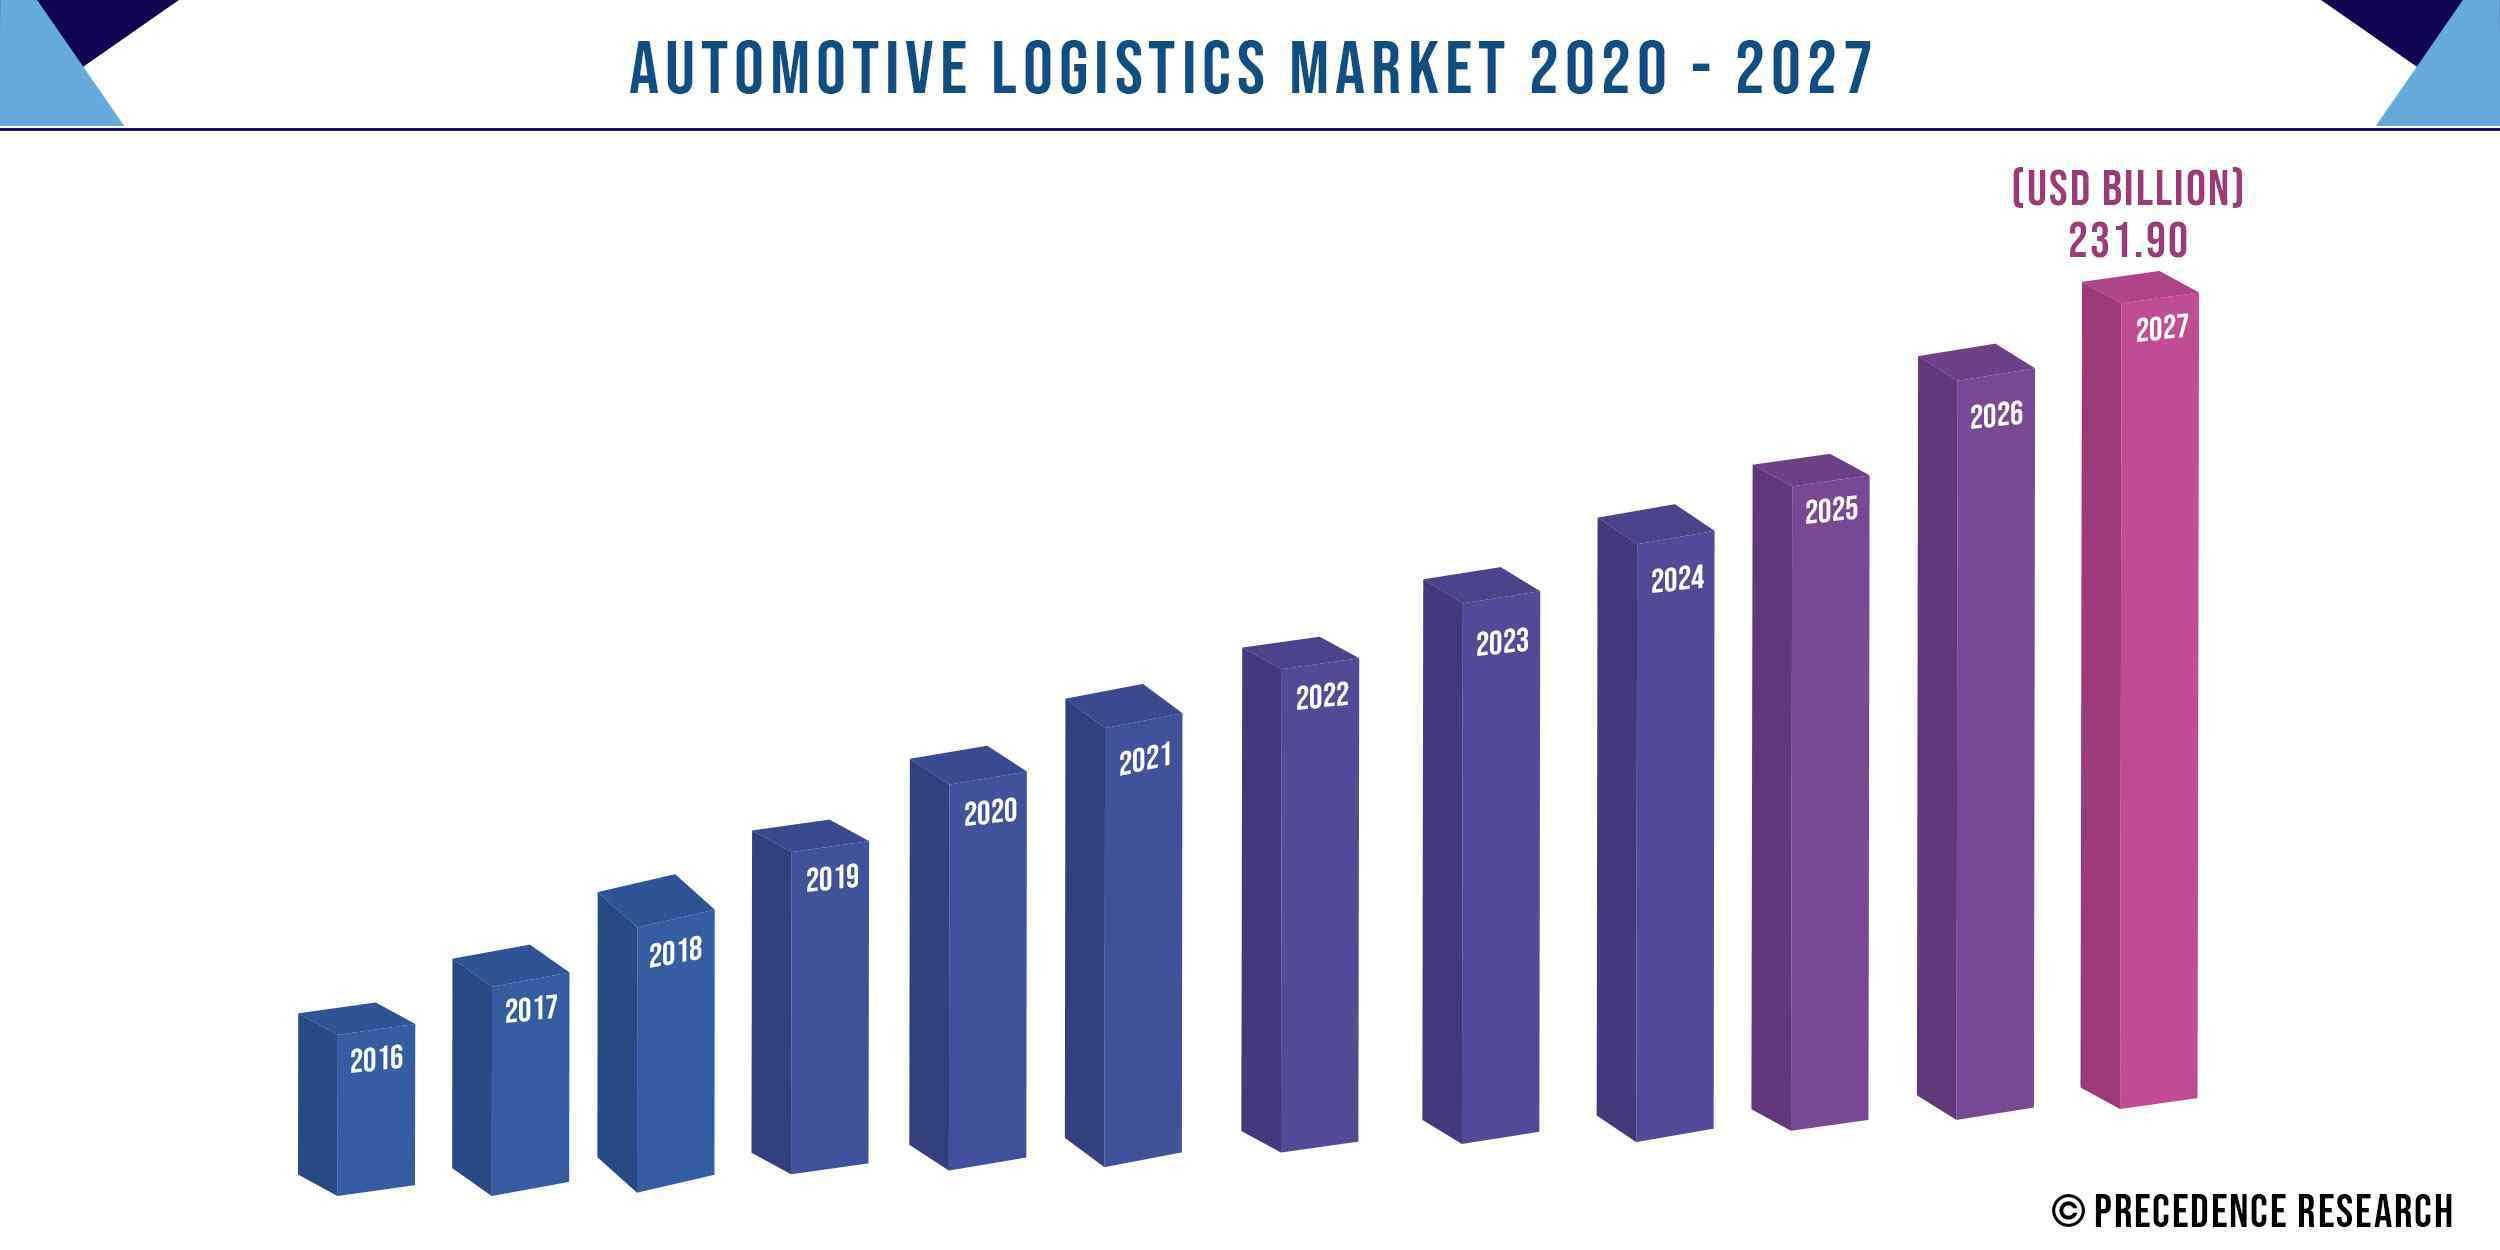 Automotive Logistics Market Size 2016-2027